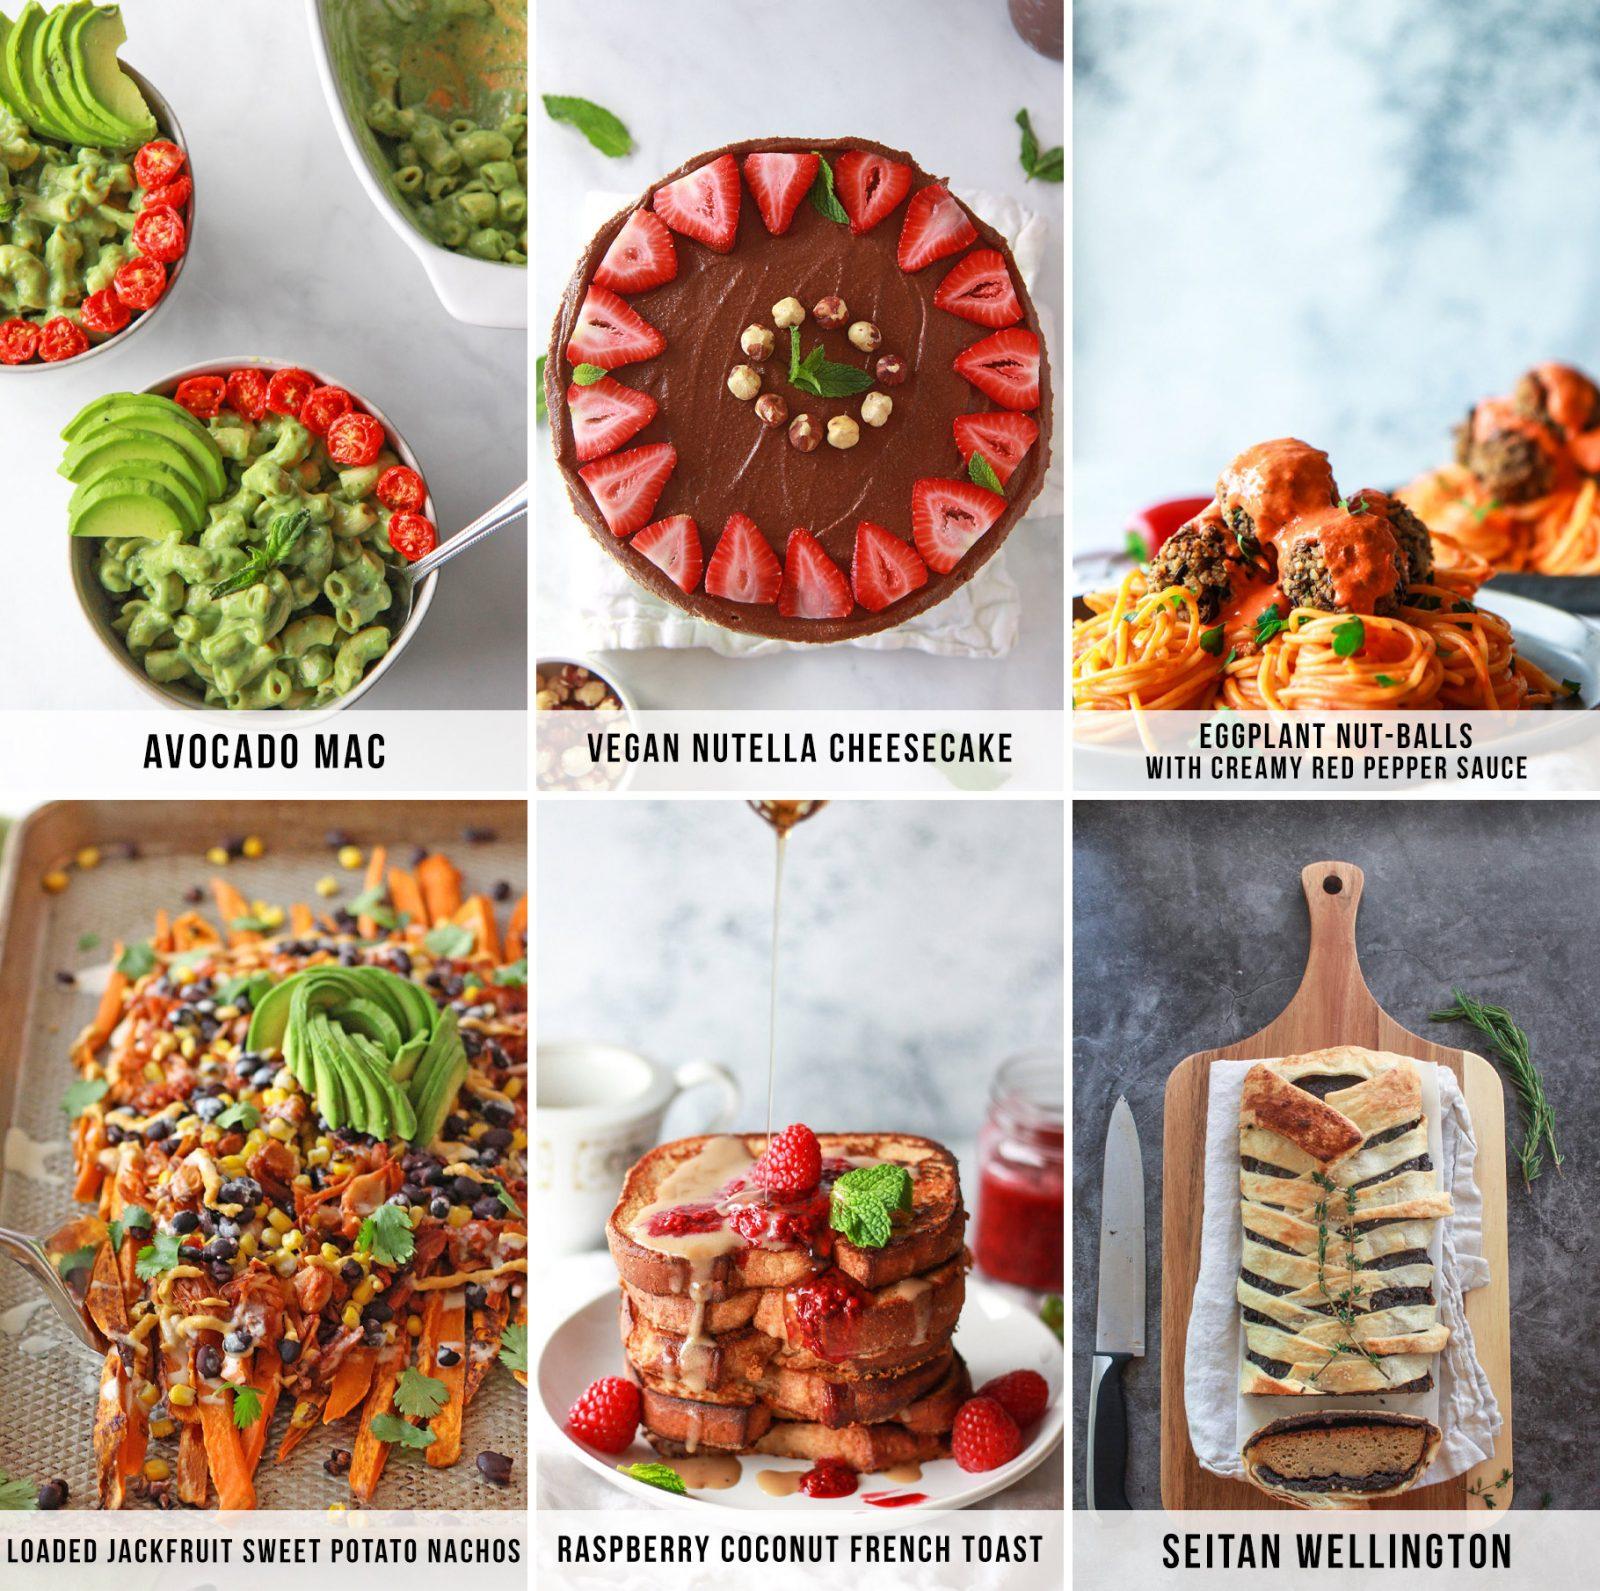 Avocado Mac, Vegan Nutella Cheesecake, Sweet Potato Jackfruit Nachos, and more!